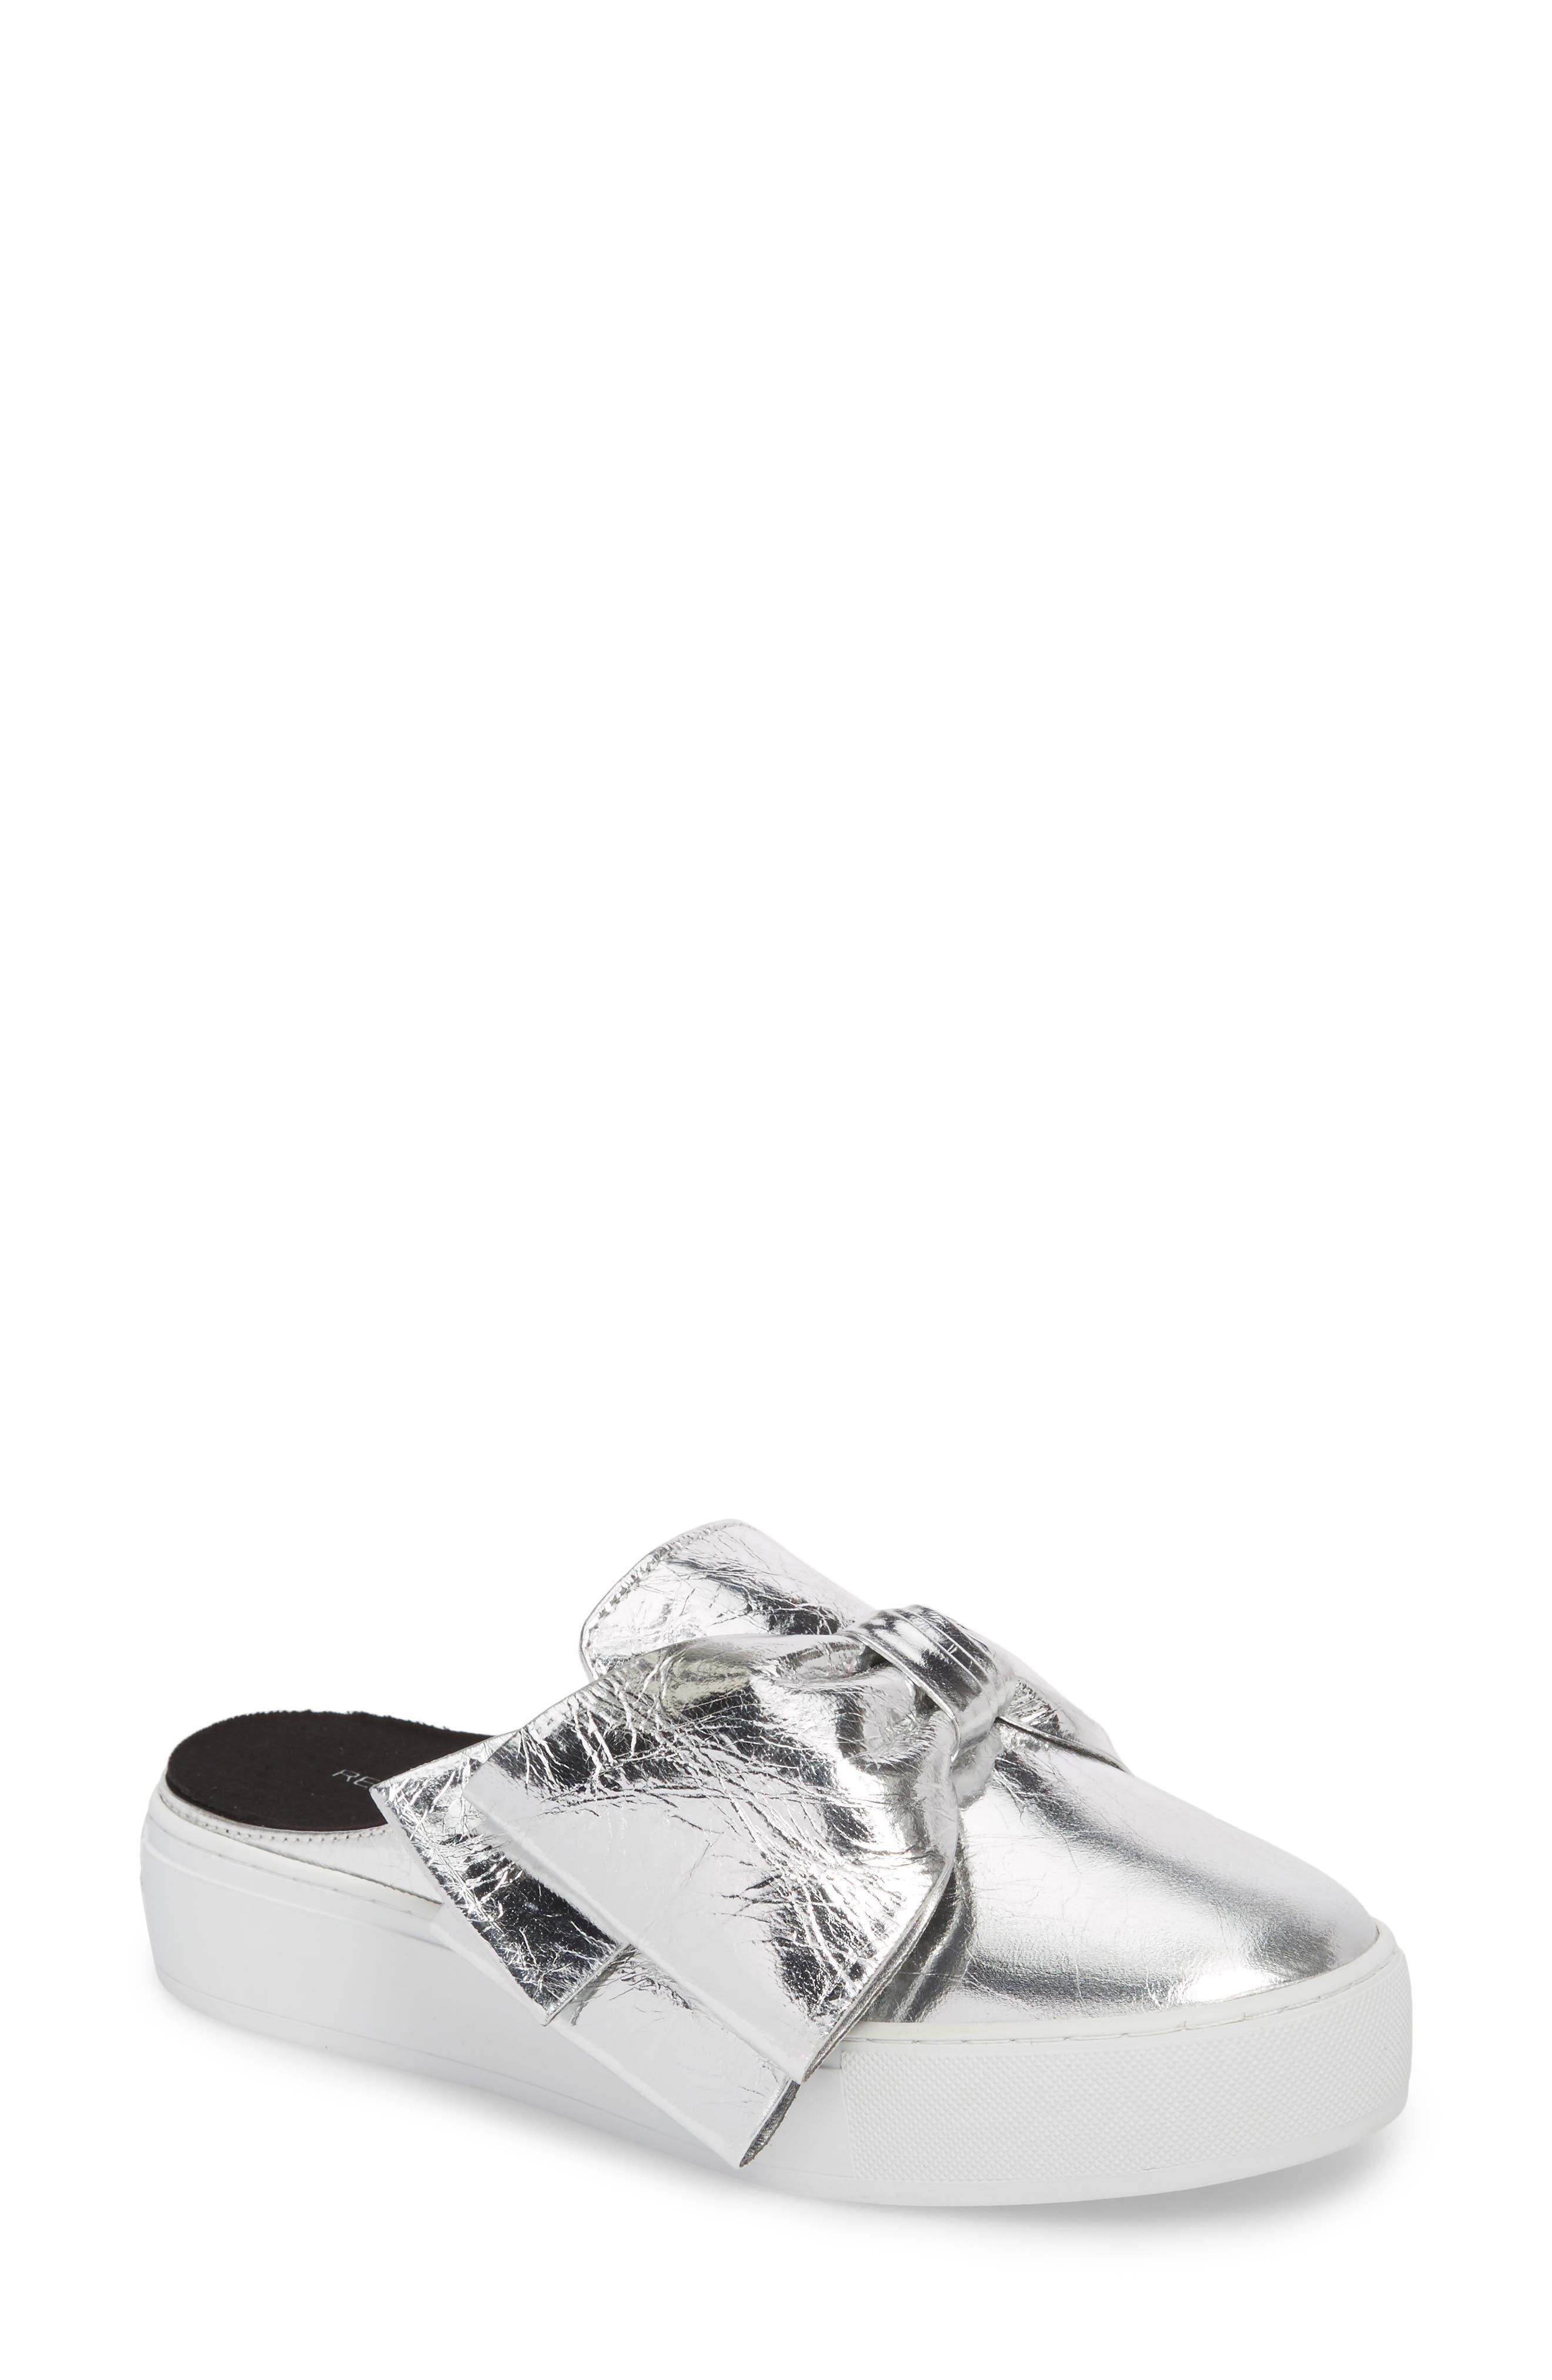 Neva Sneaker Mule,                             Main thumbnail 2, color,